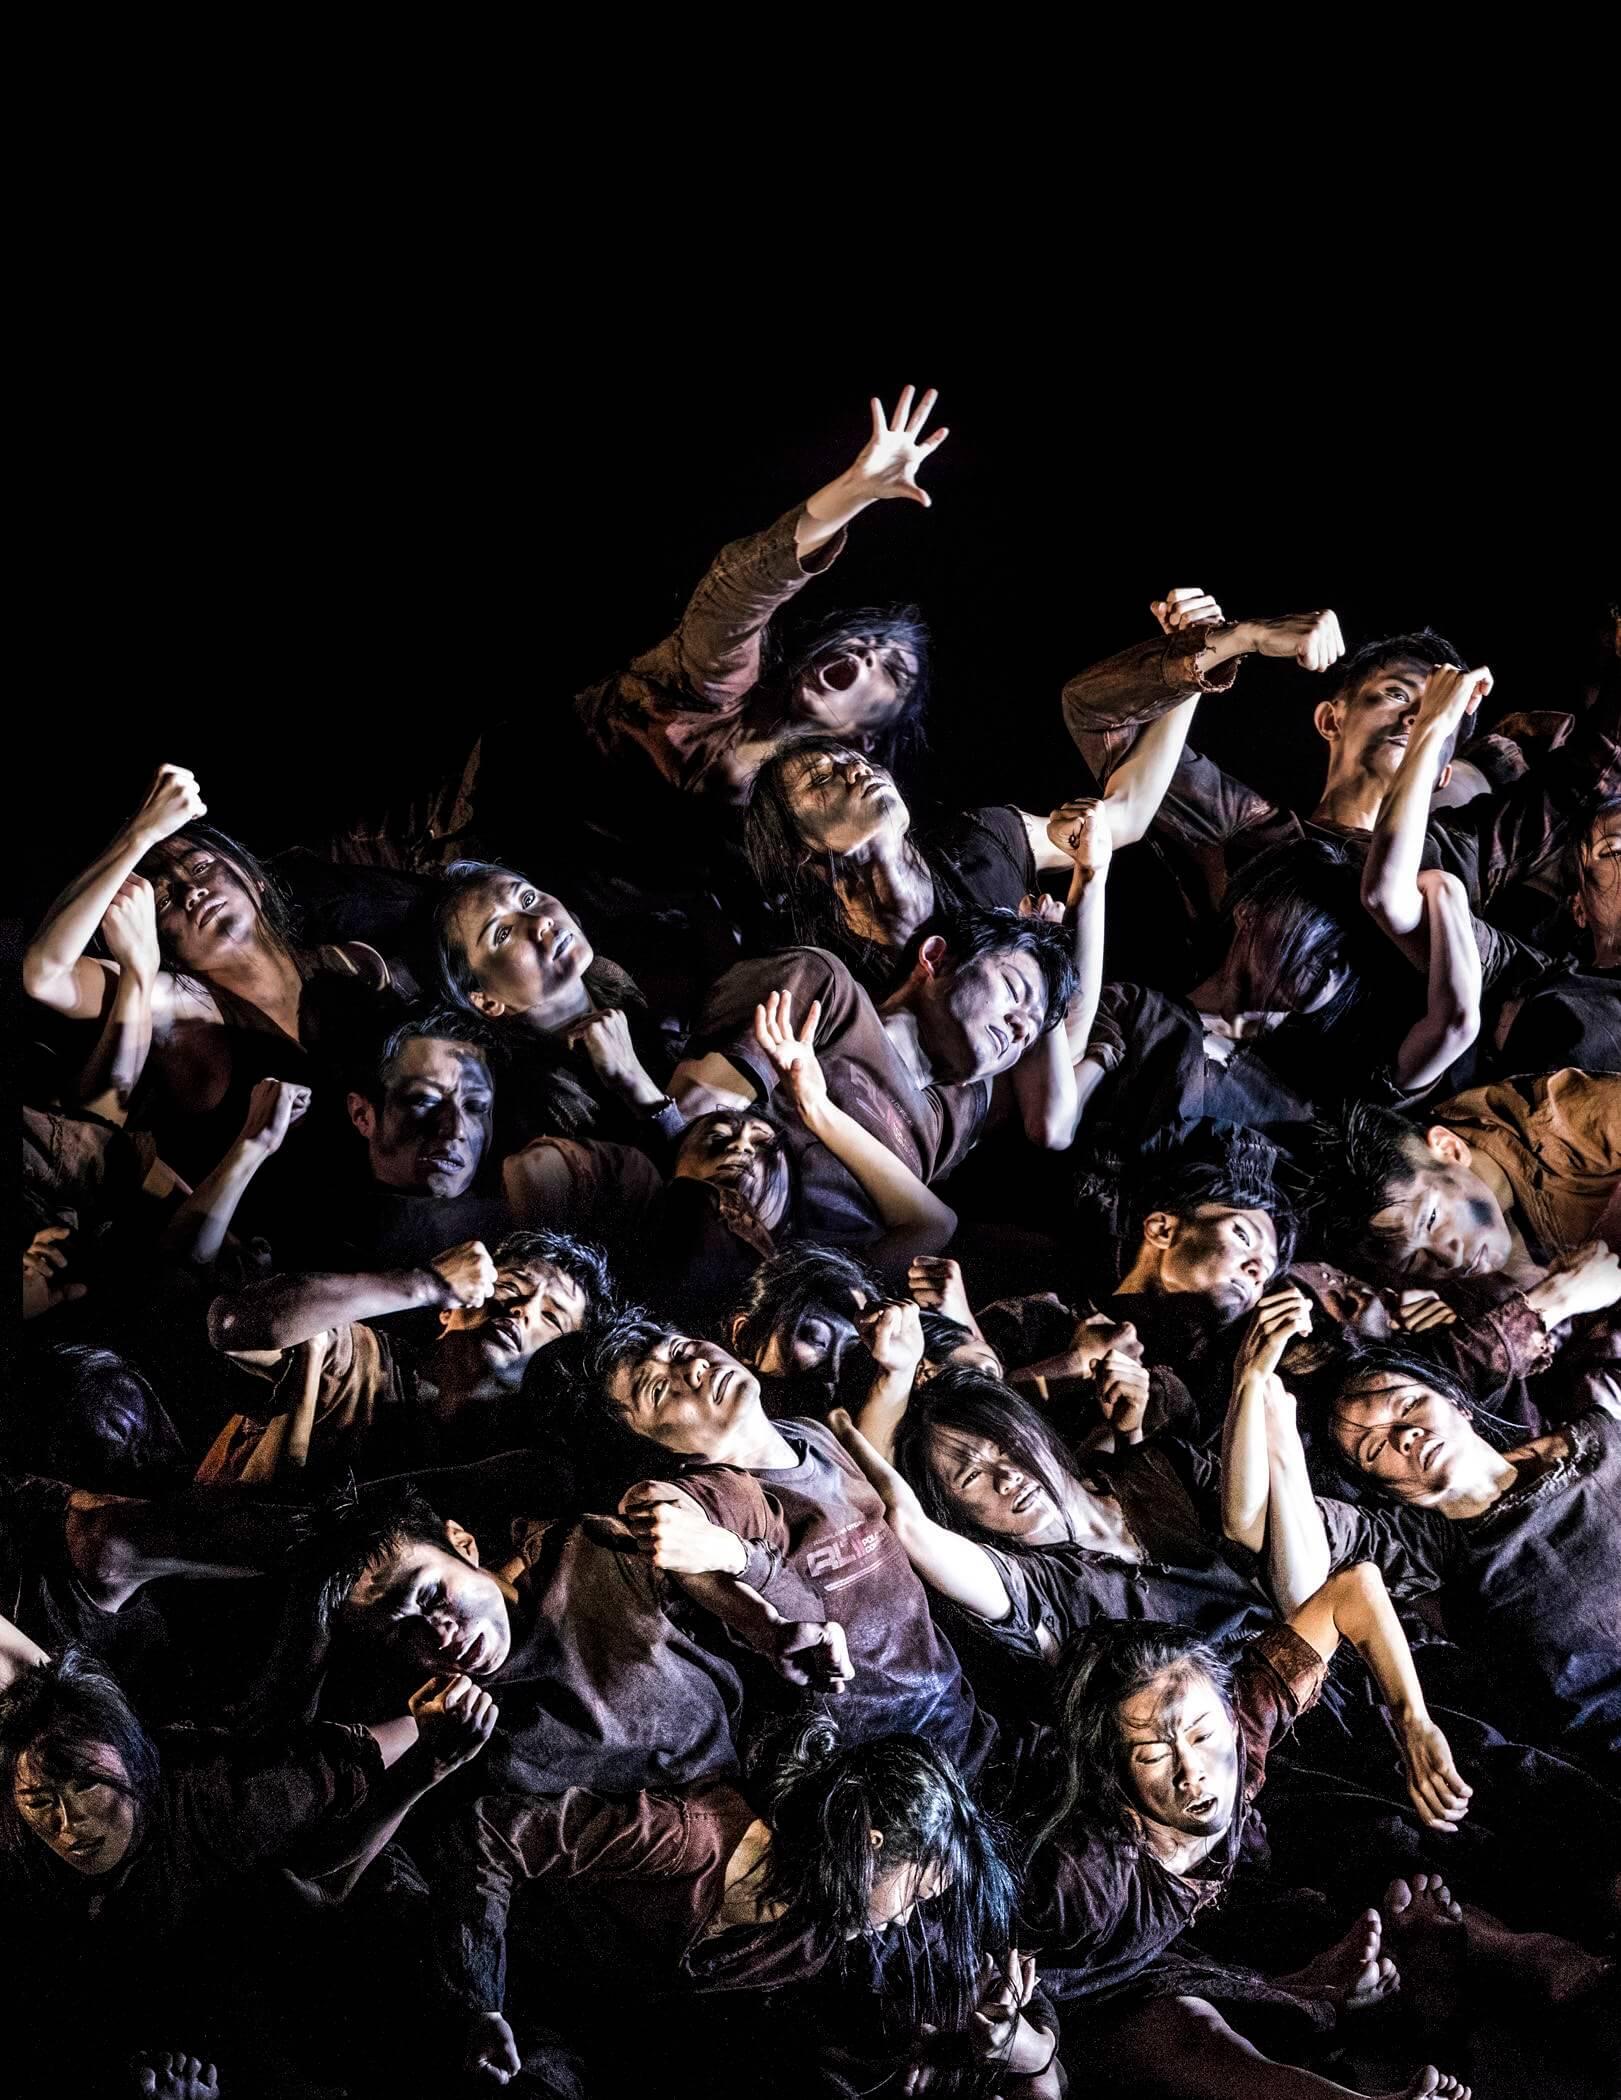 Cloud Gate šokio teatras_Dulkė_Liu Chen-hsiang nuotr.